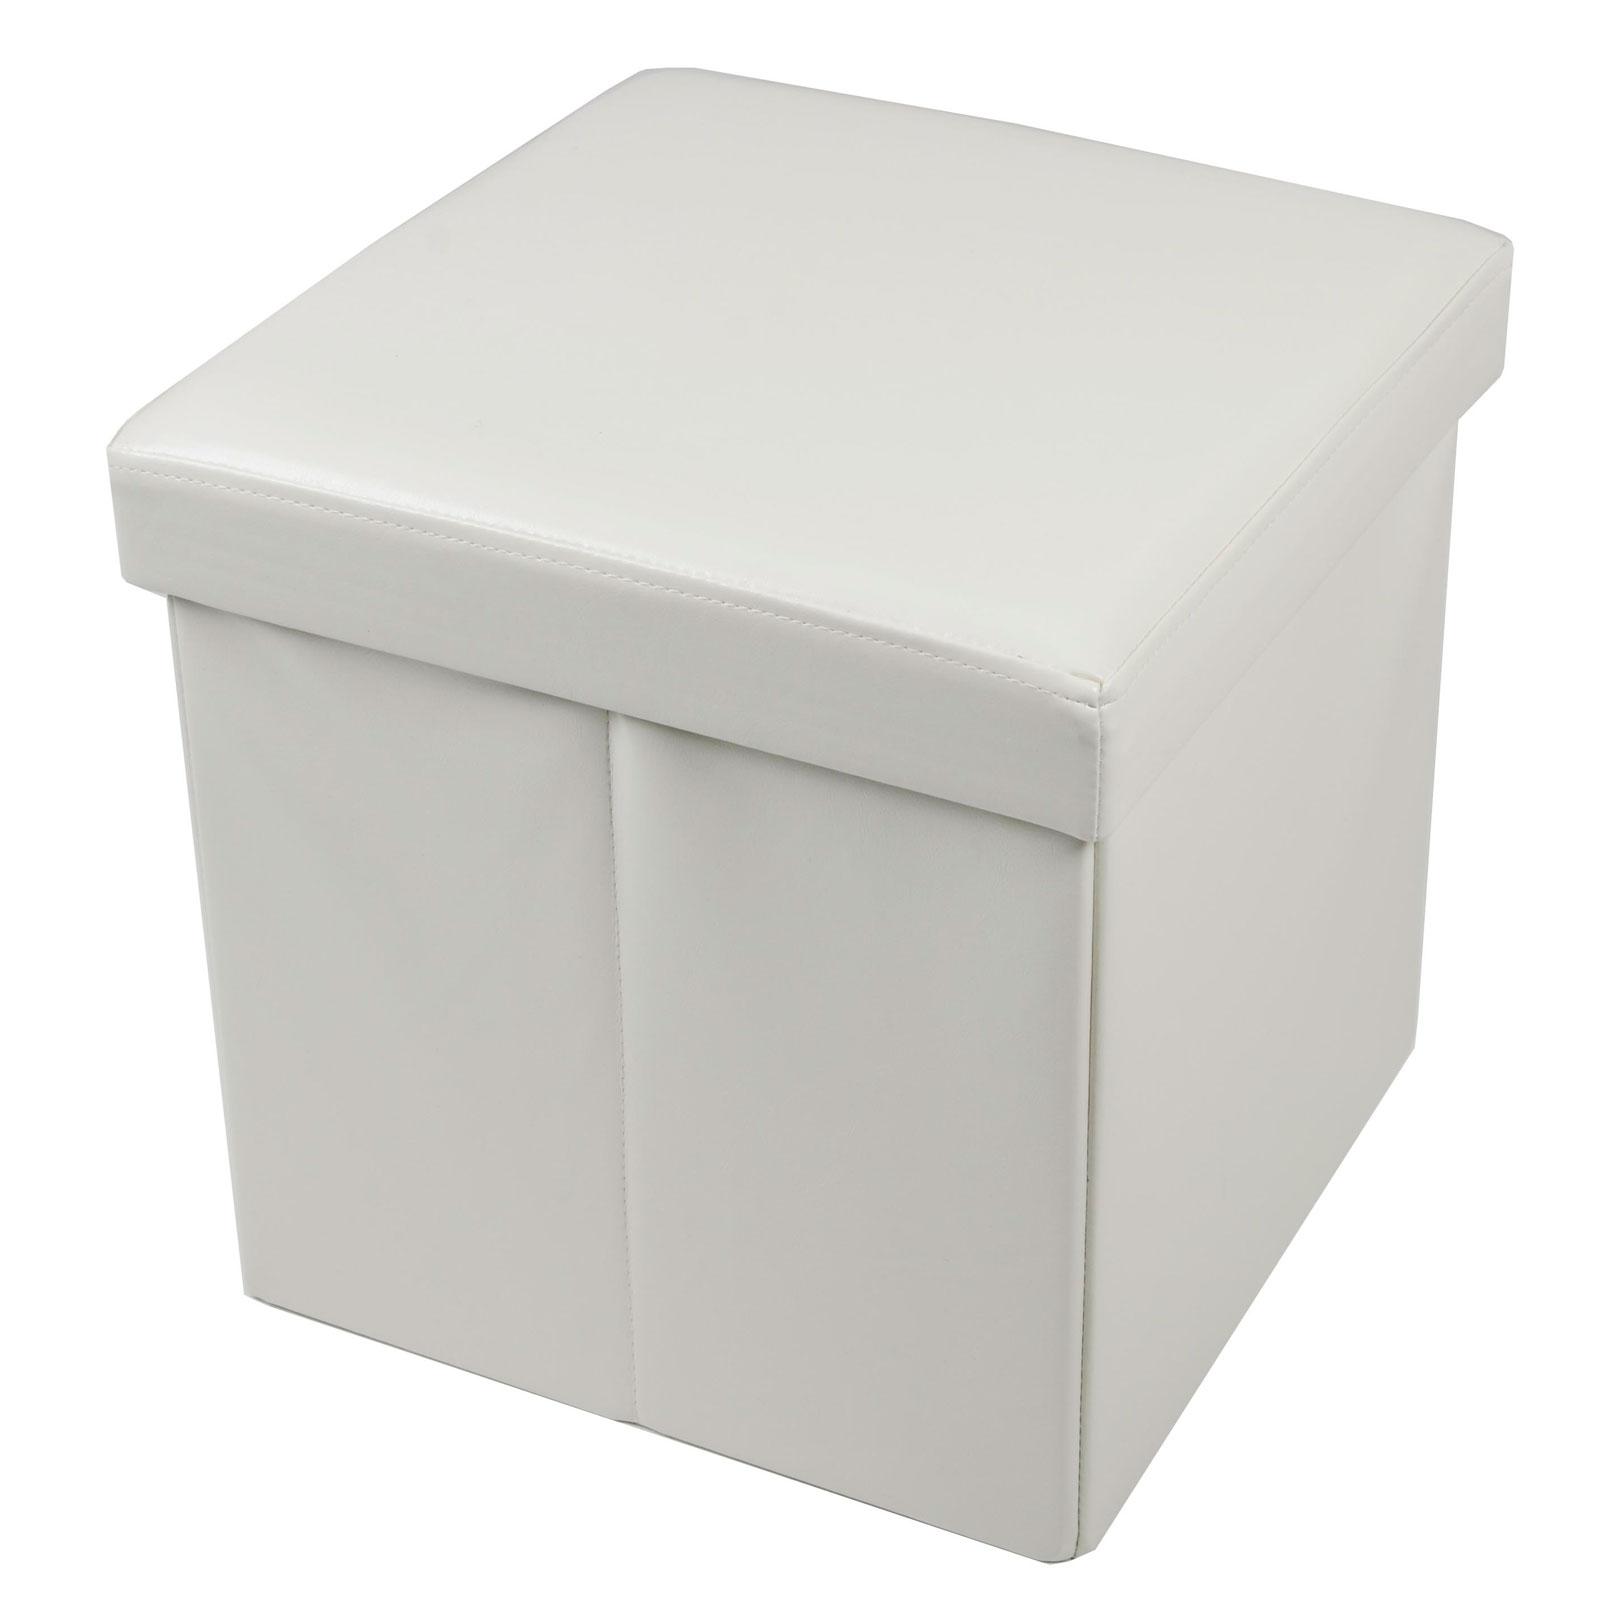 38cm Folding Storage Pouffe Cube Foot Stool Seat